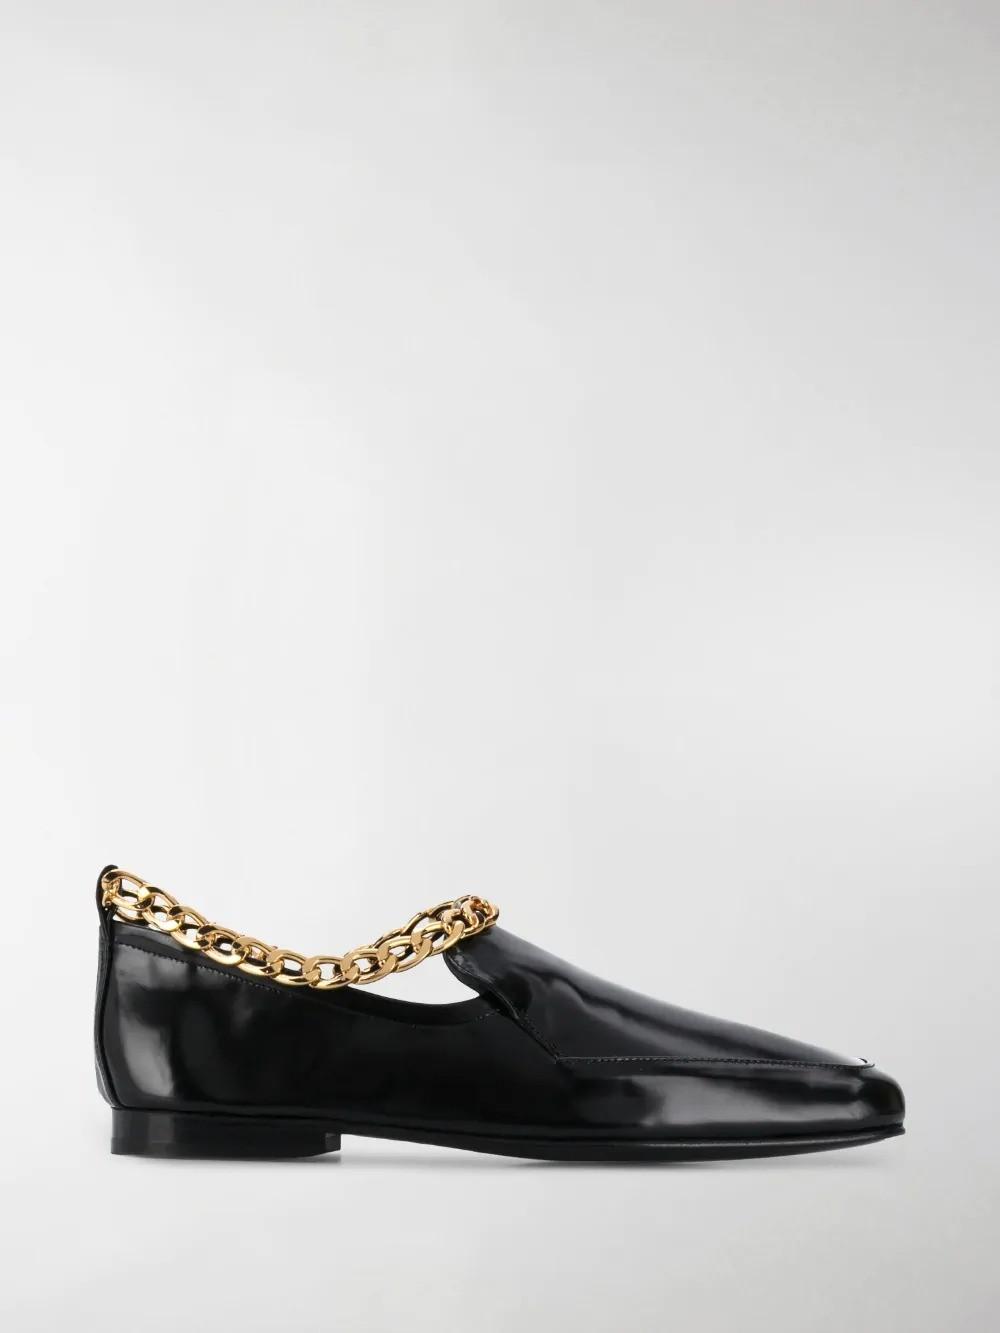 BY FAR 链条平底鞋